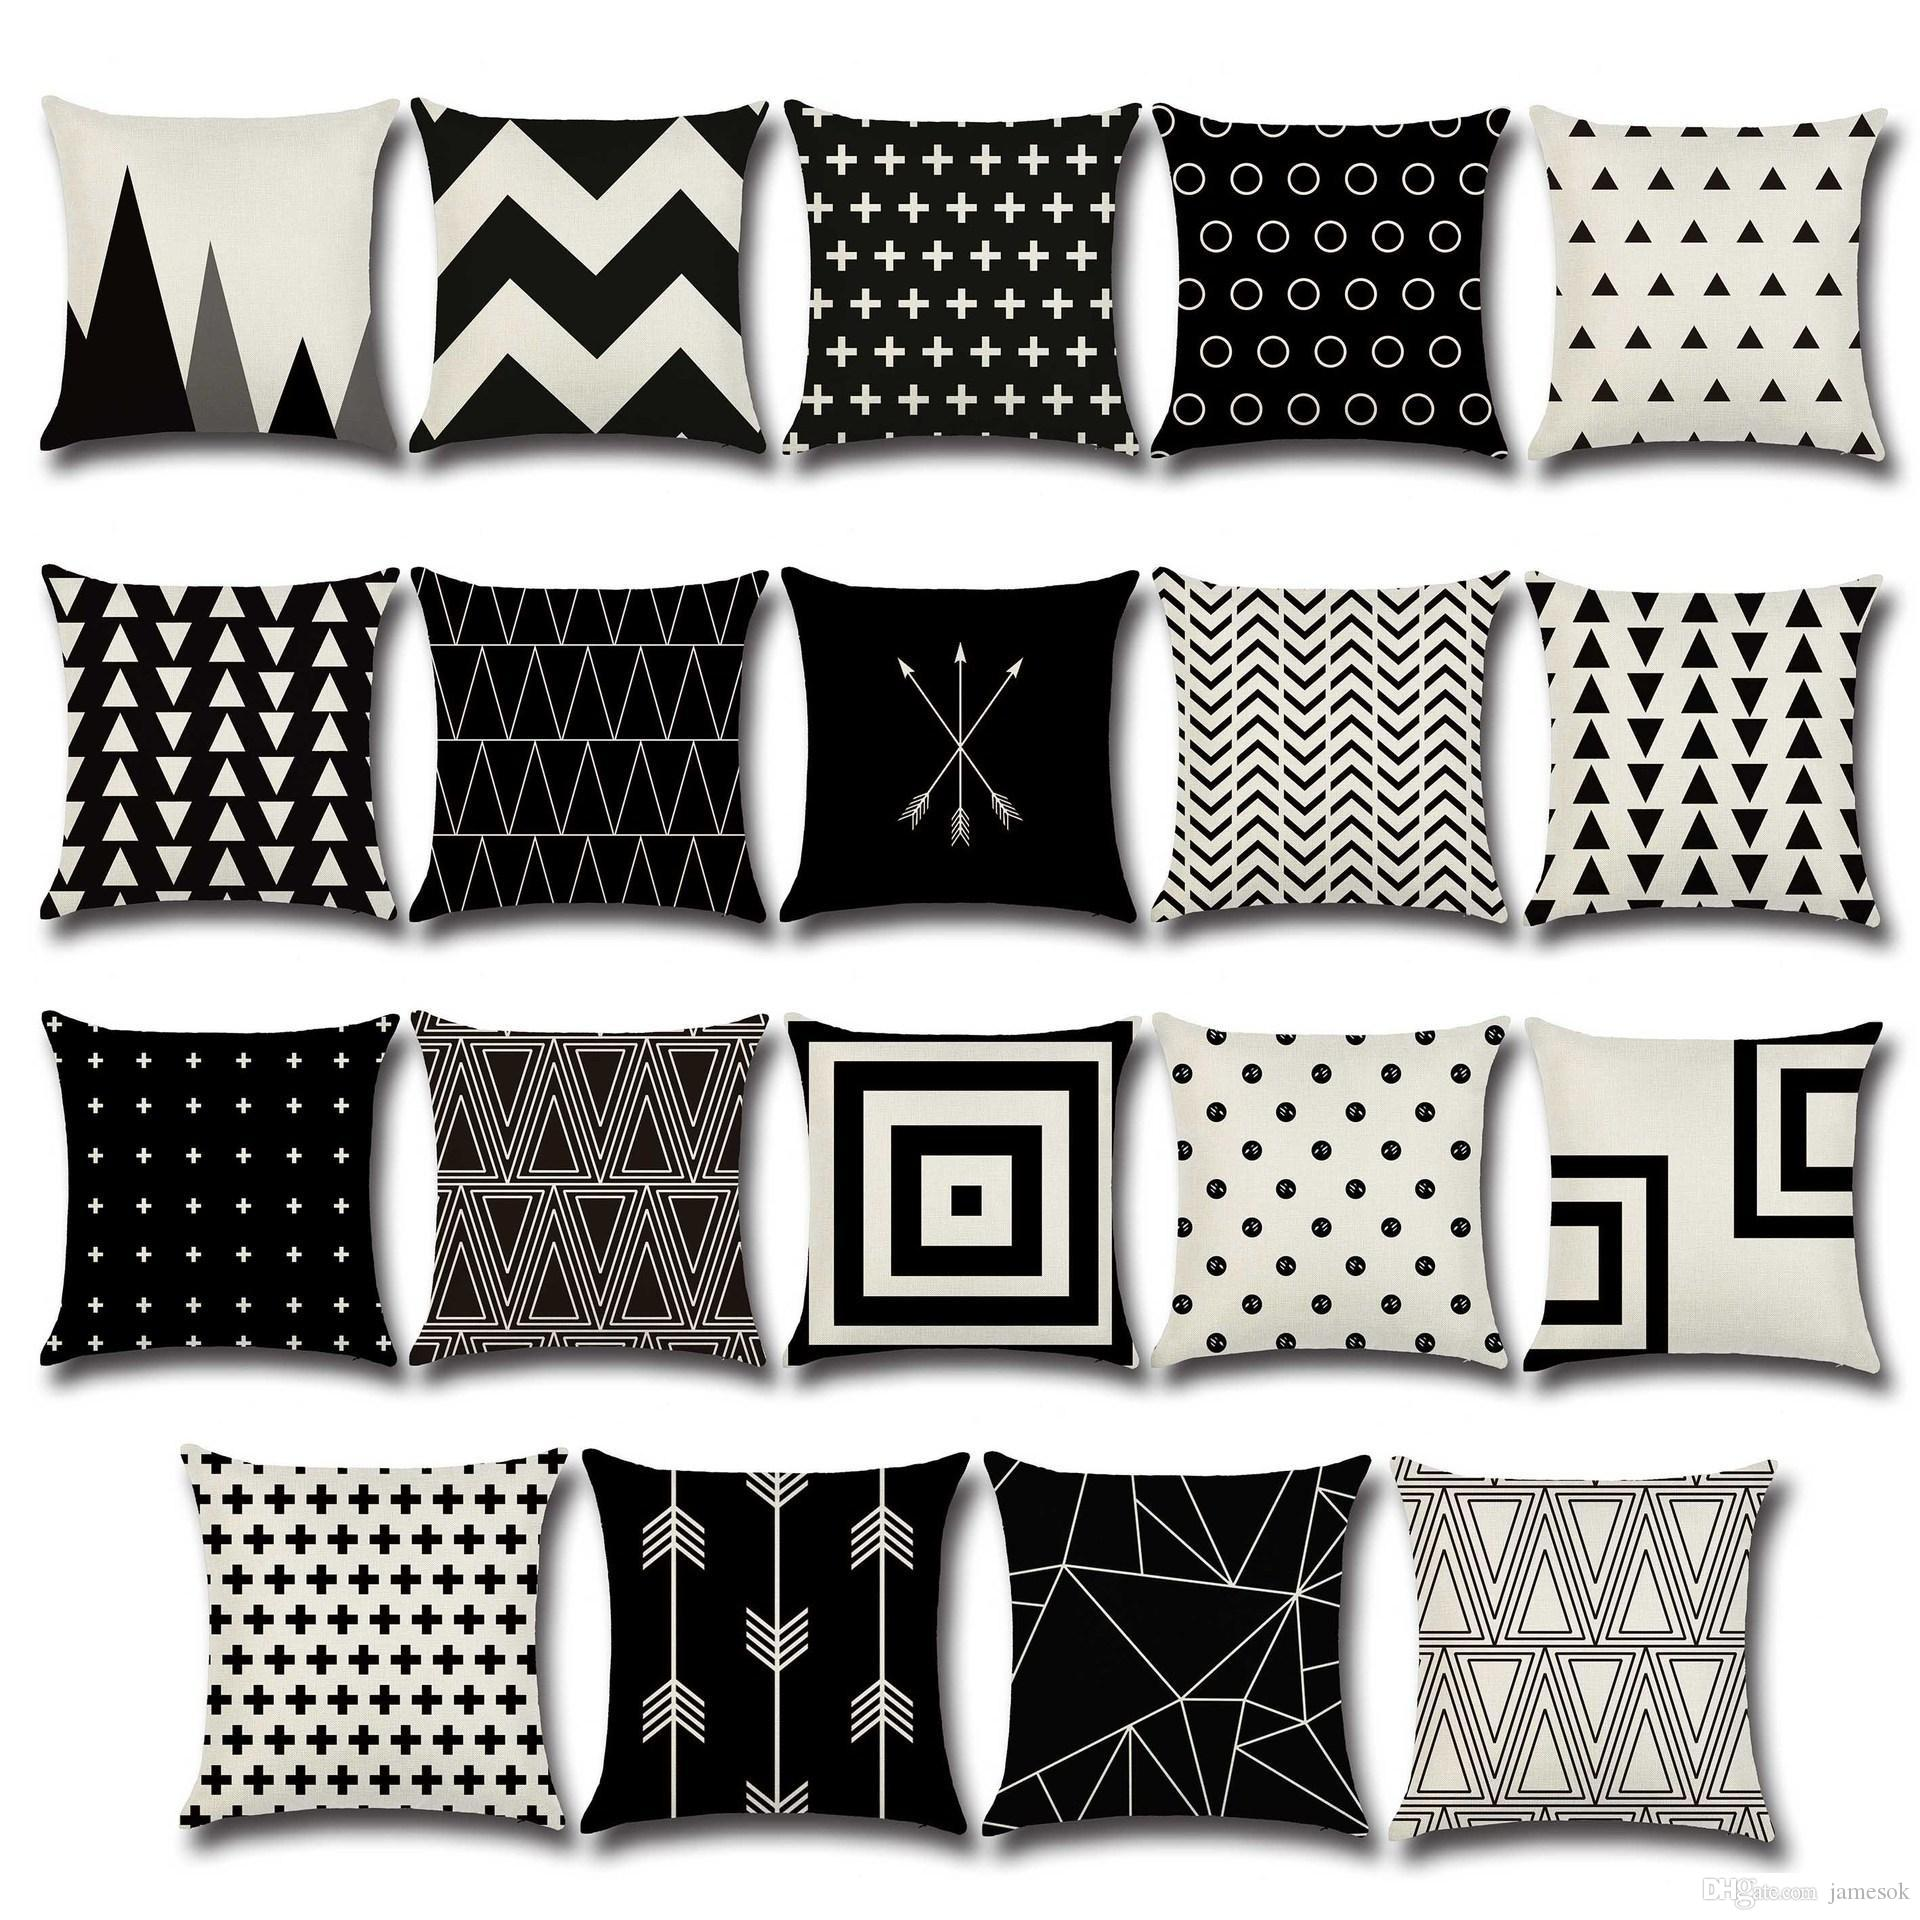 Pillow Case Black And White Pattern Pillowcase Cotton Linen Printed